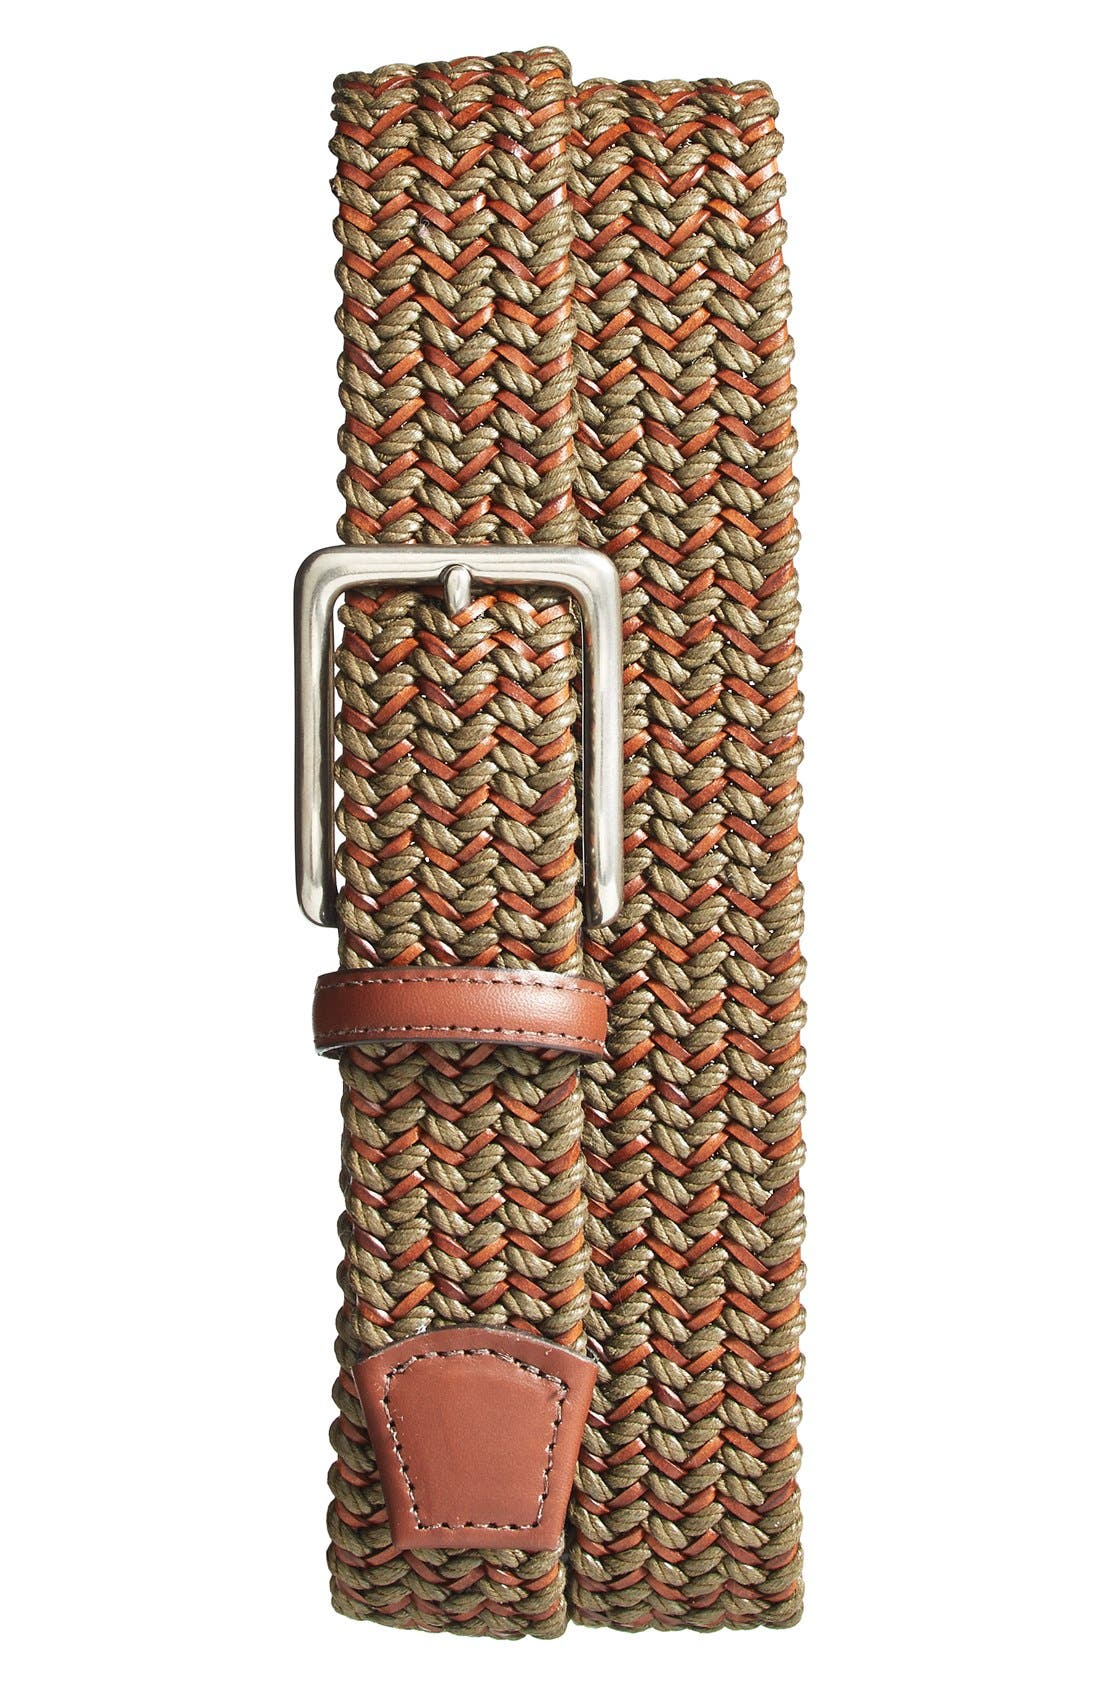 TORINO BELTS Woven & Leather Belt